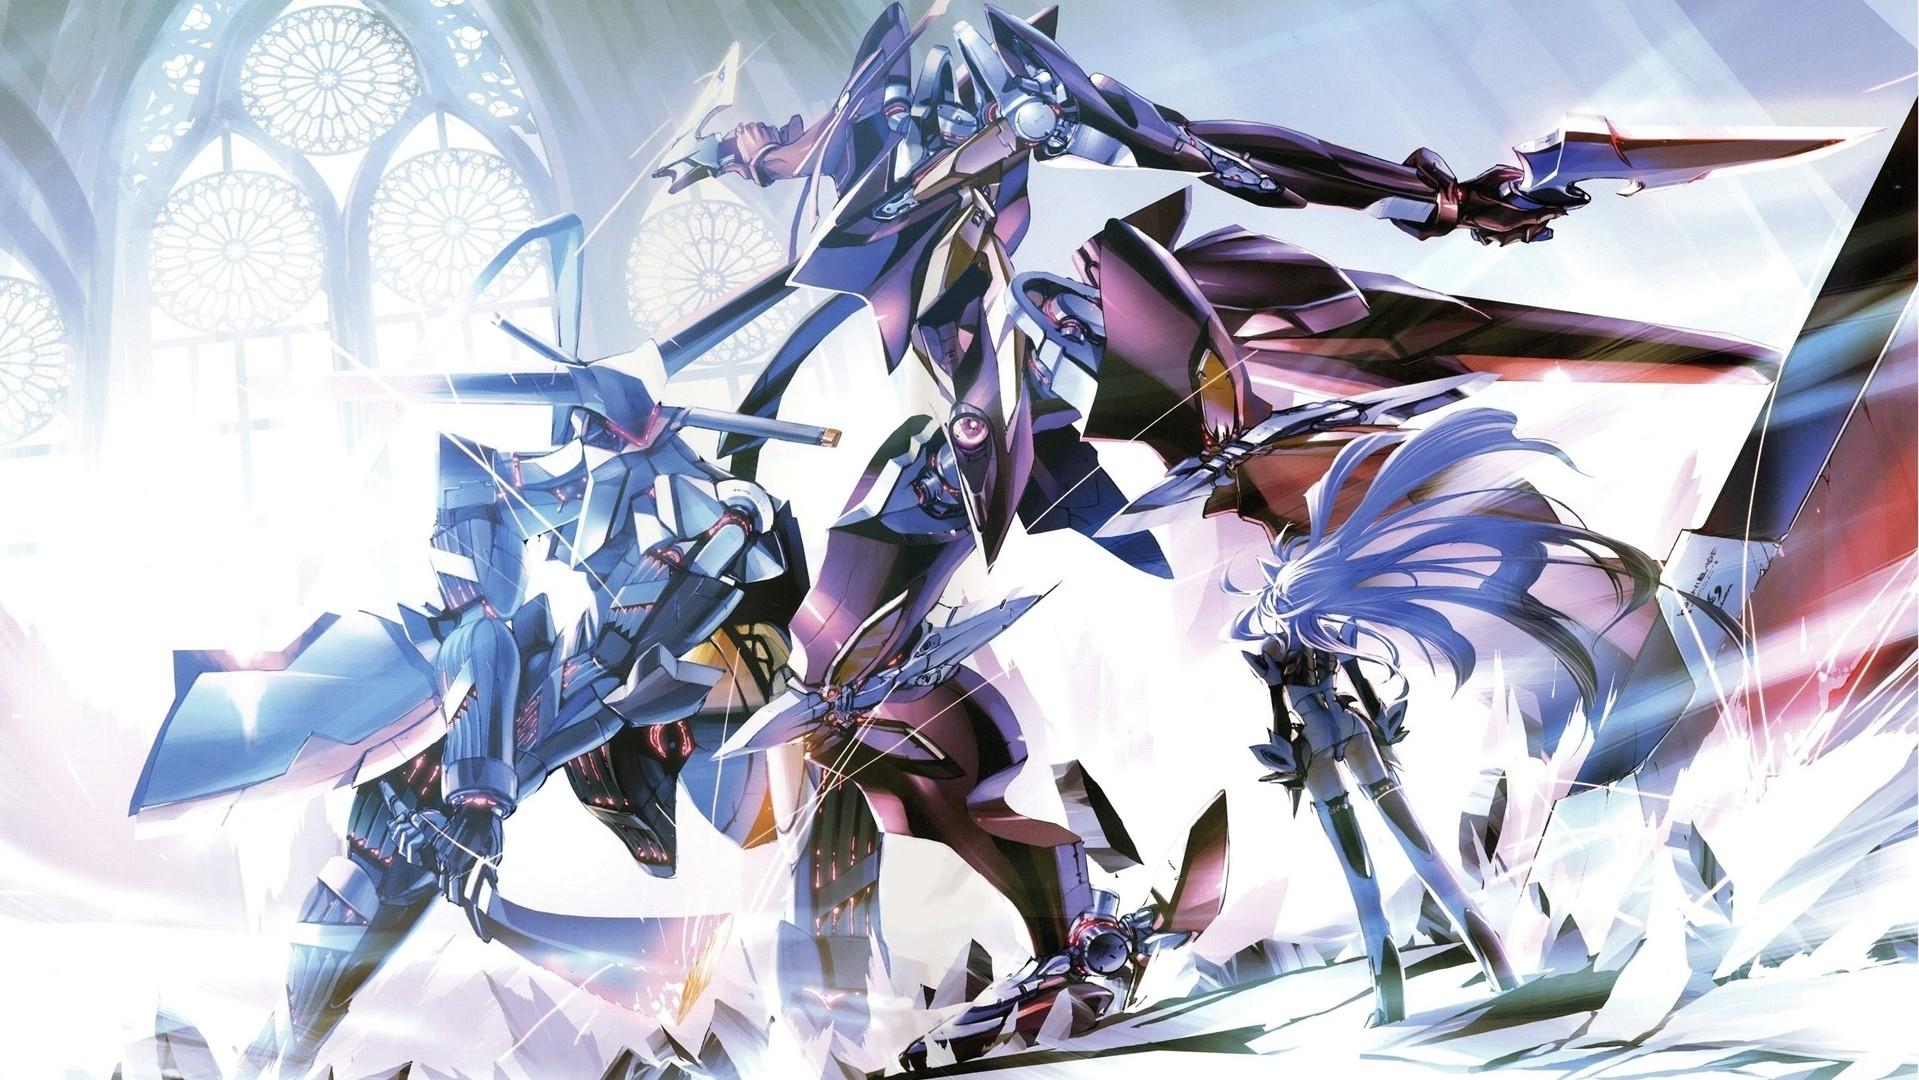 epic anime wallpaper hd resolution ~ sdeerwallpaper 1919×1080 epic